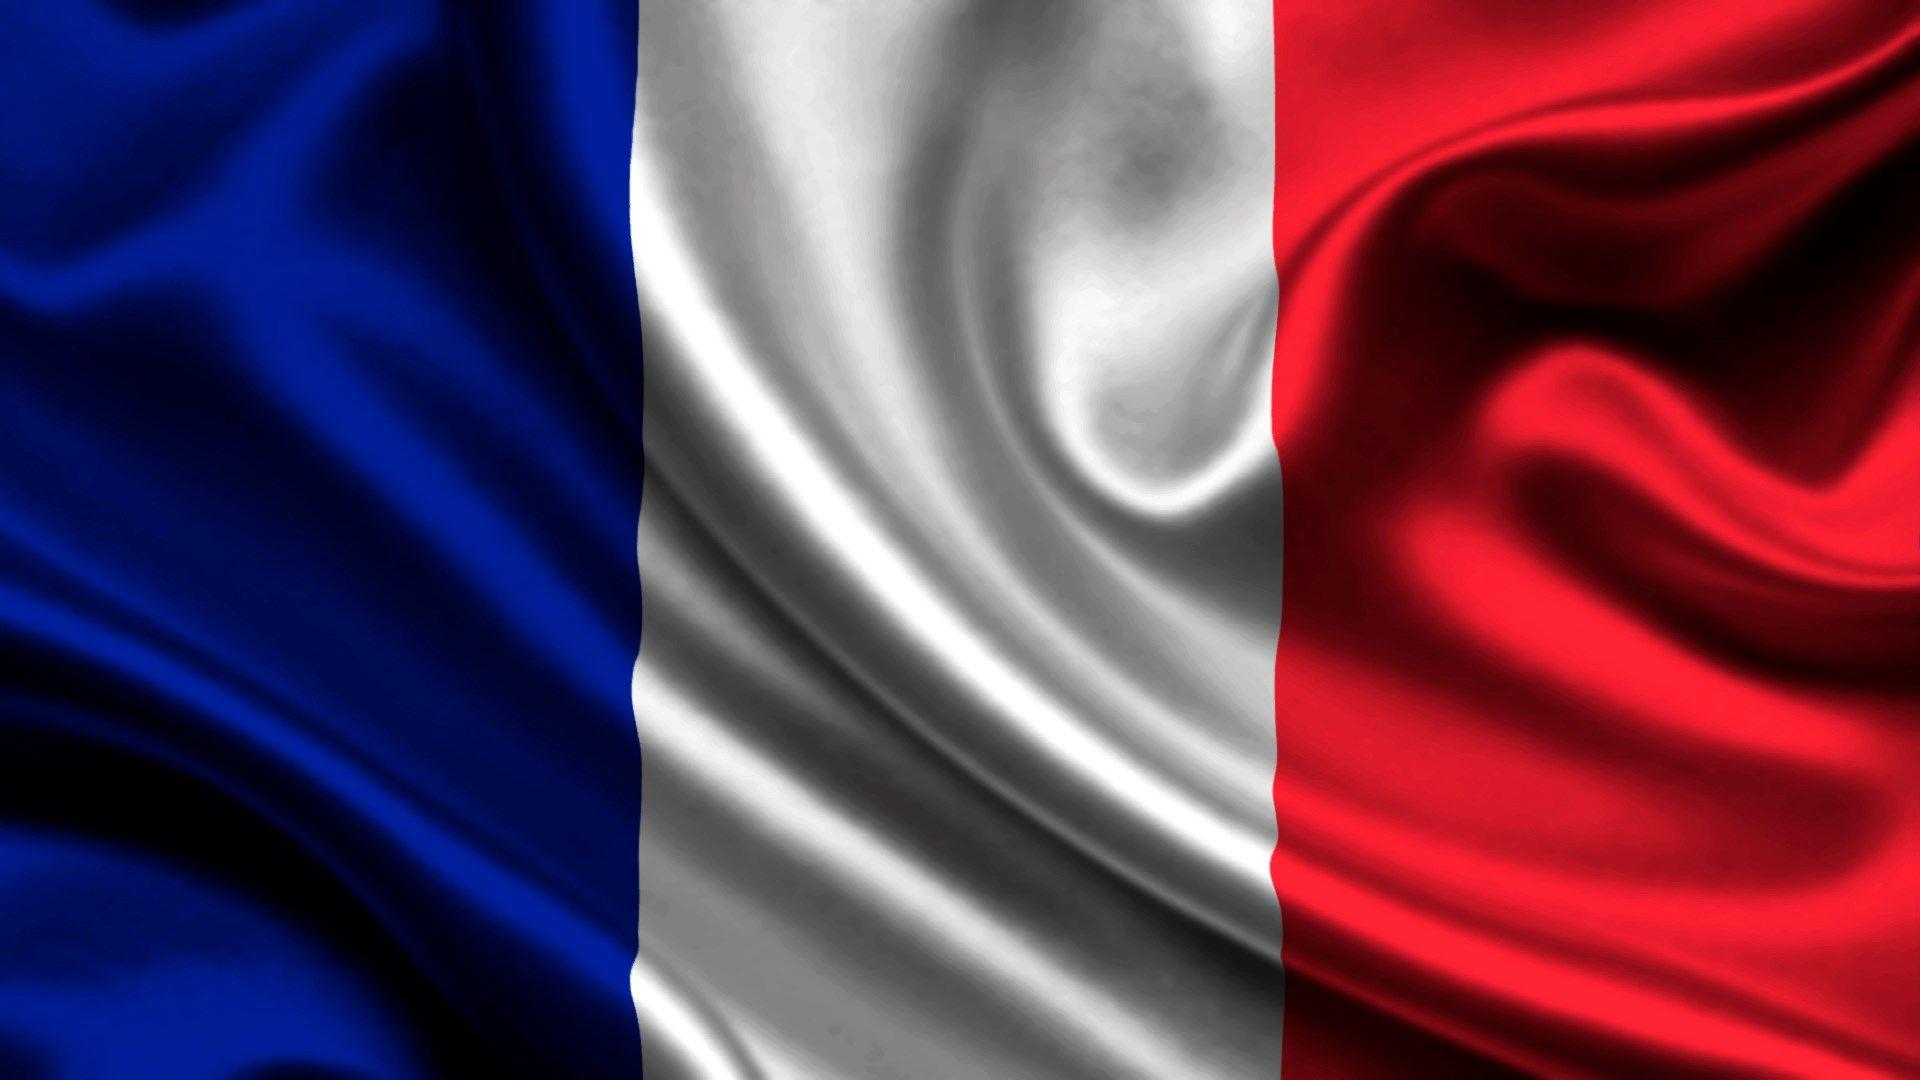 French Flag Hd Wallpaper Flag France Flag Italy Flag